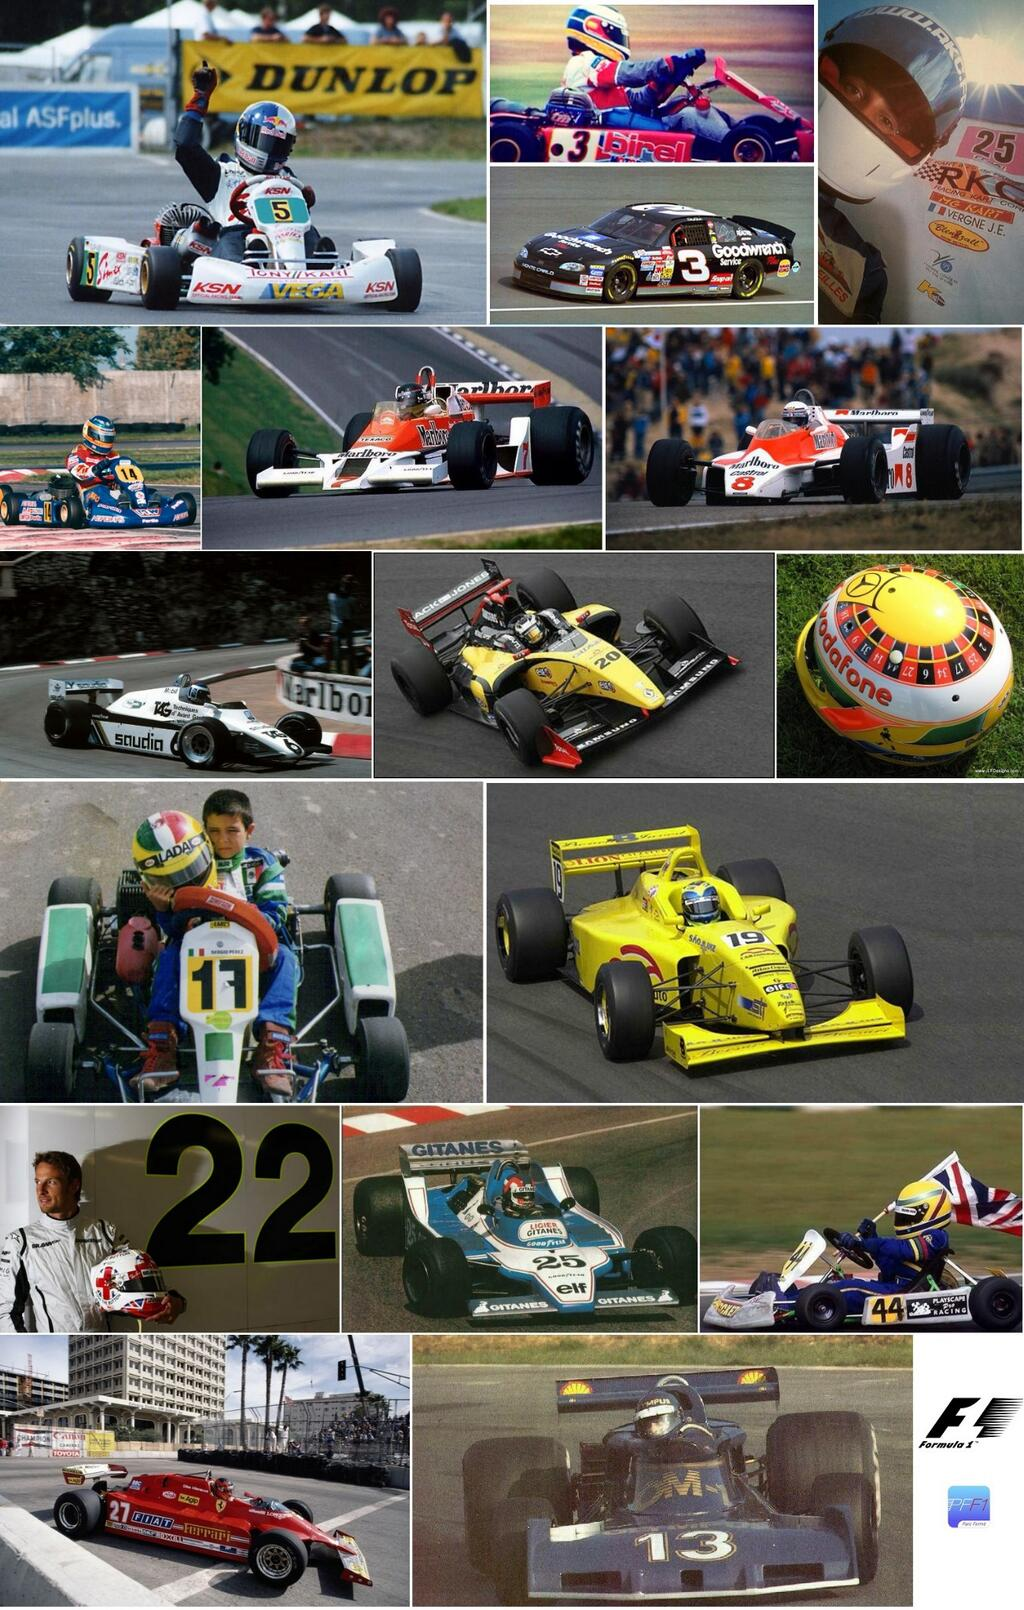 """@bgarloff: ""@PFF1: #F1 Formula 1 Start numbers pictorial. http://t.co/oZ3AxqPpYA"" this explains a lot!!!"""